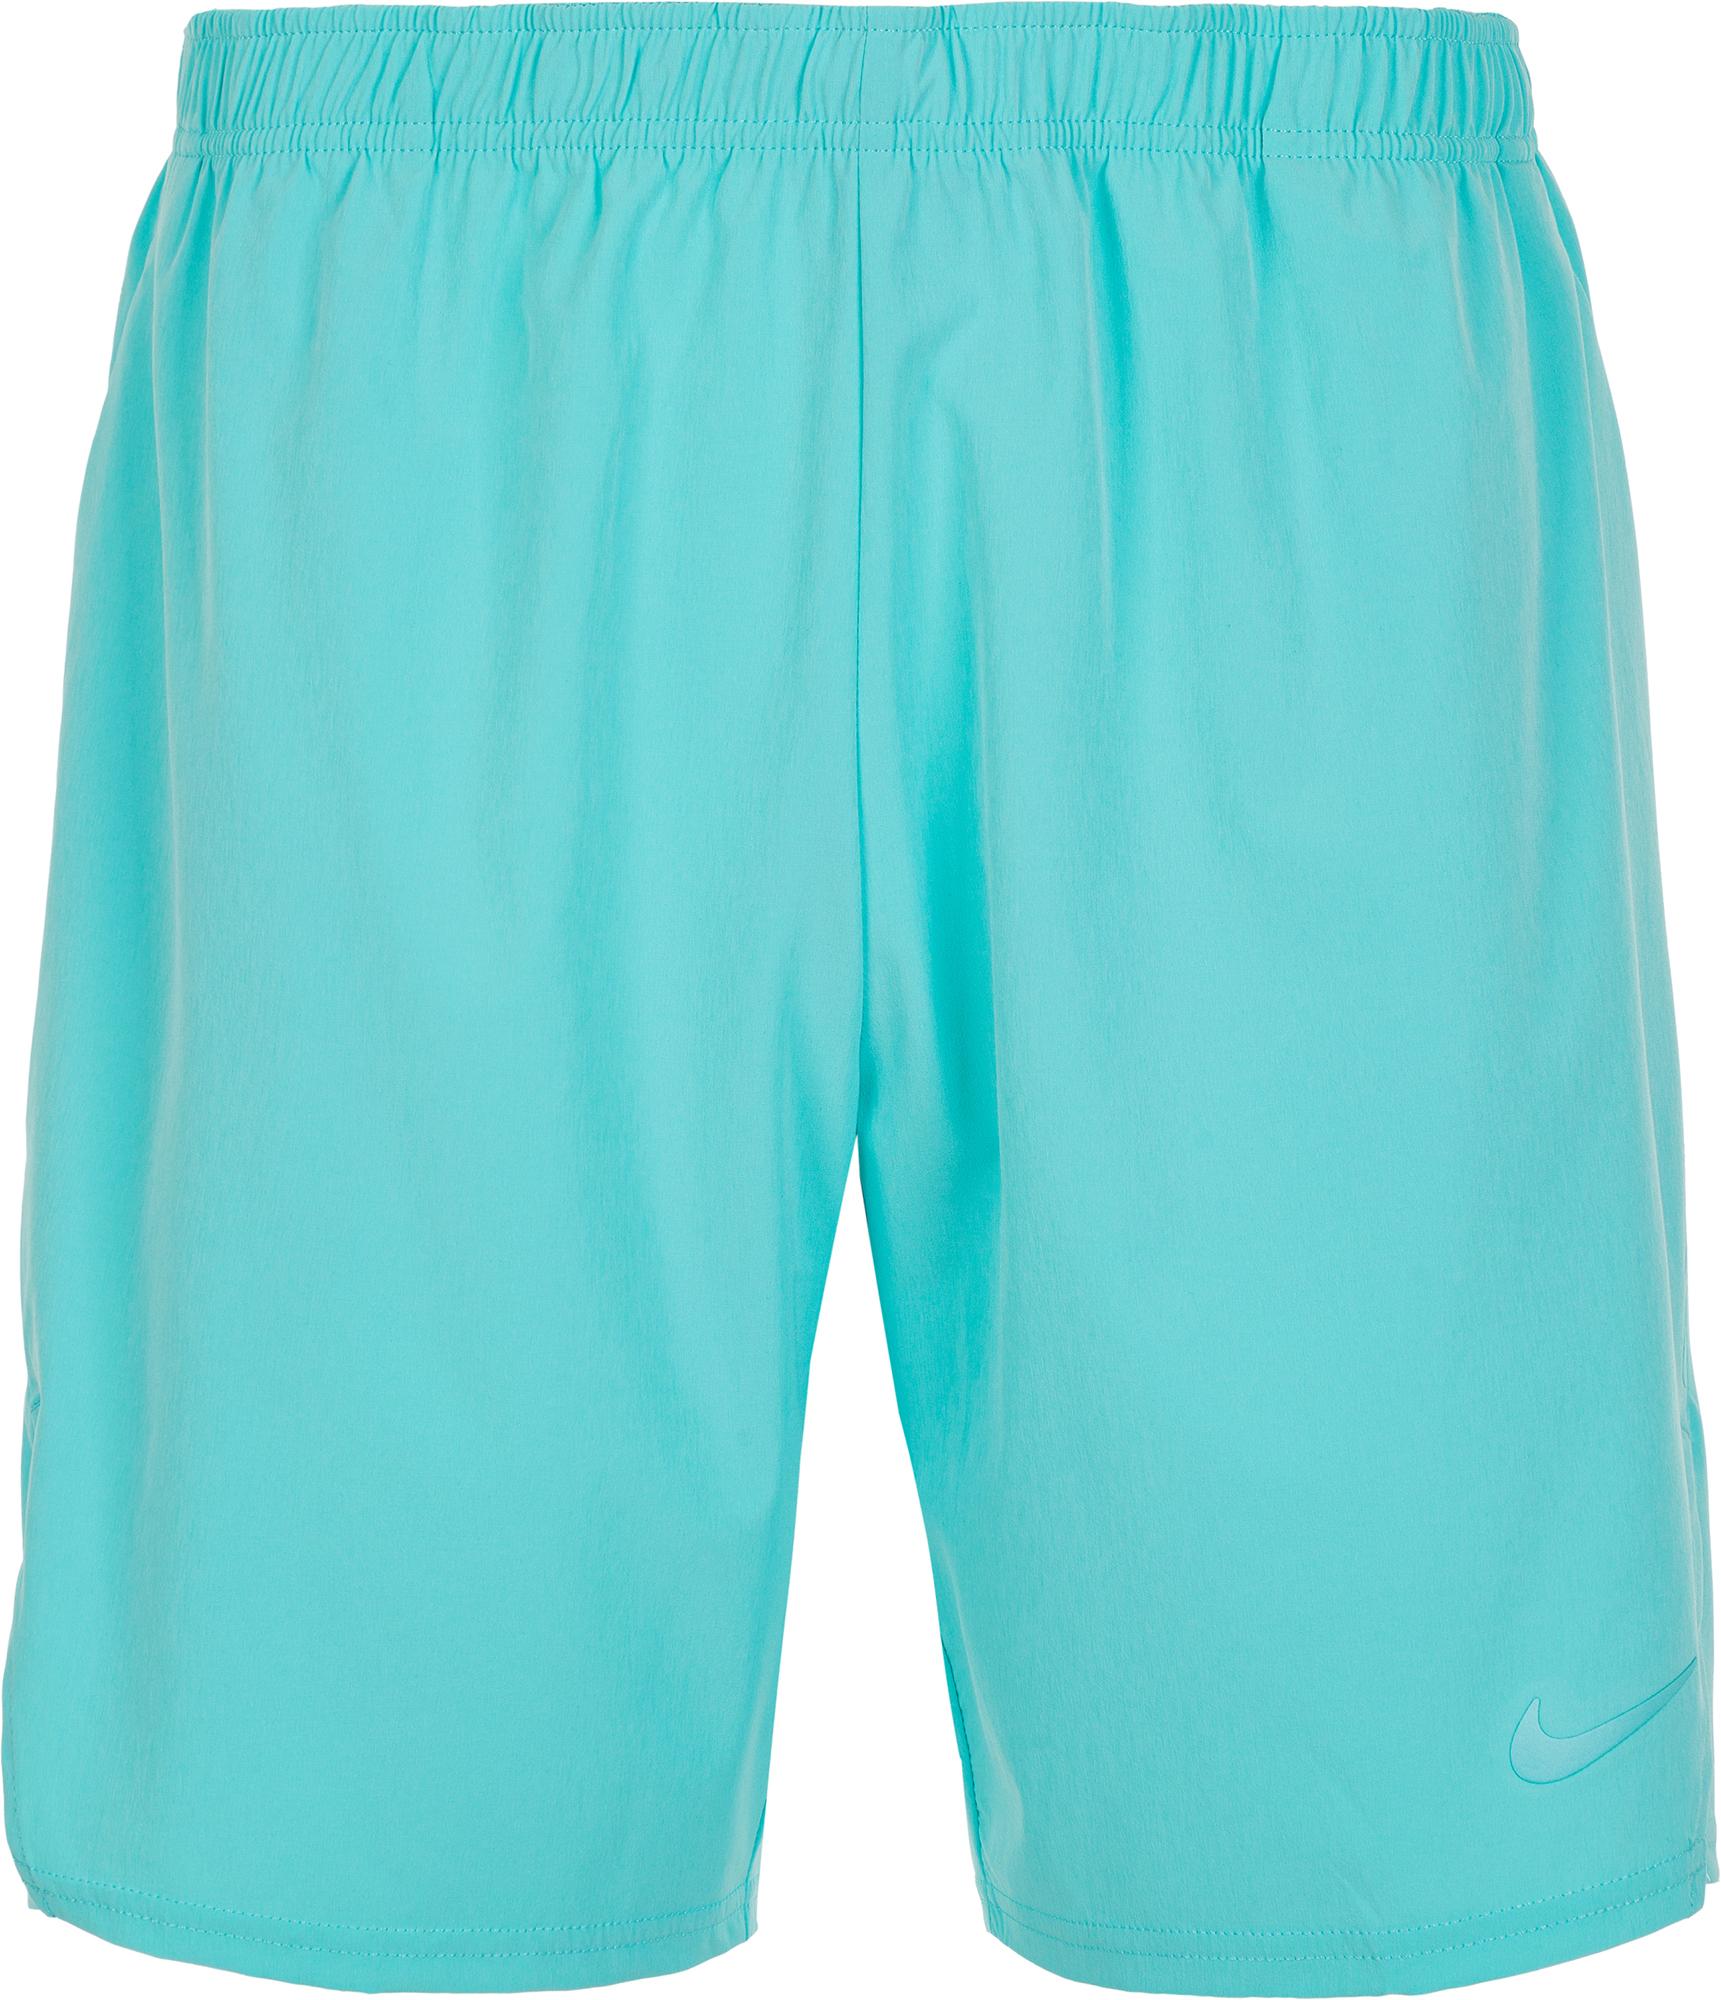 Nike Шорты мужские Nike Court Flex Ace, размер 50-52 цены онлайн